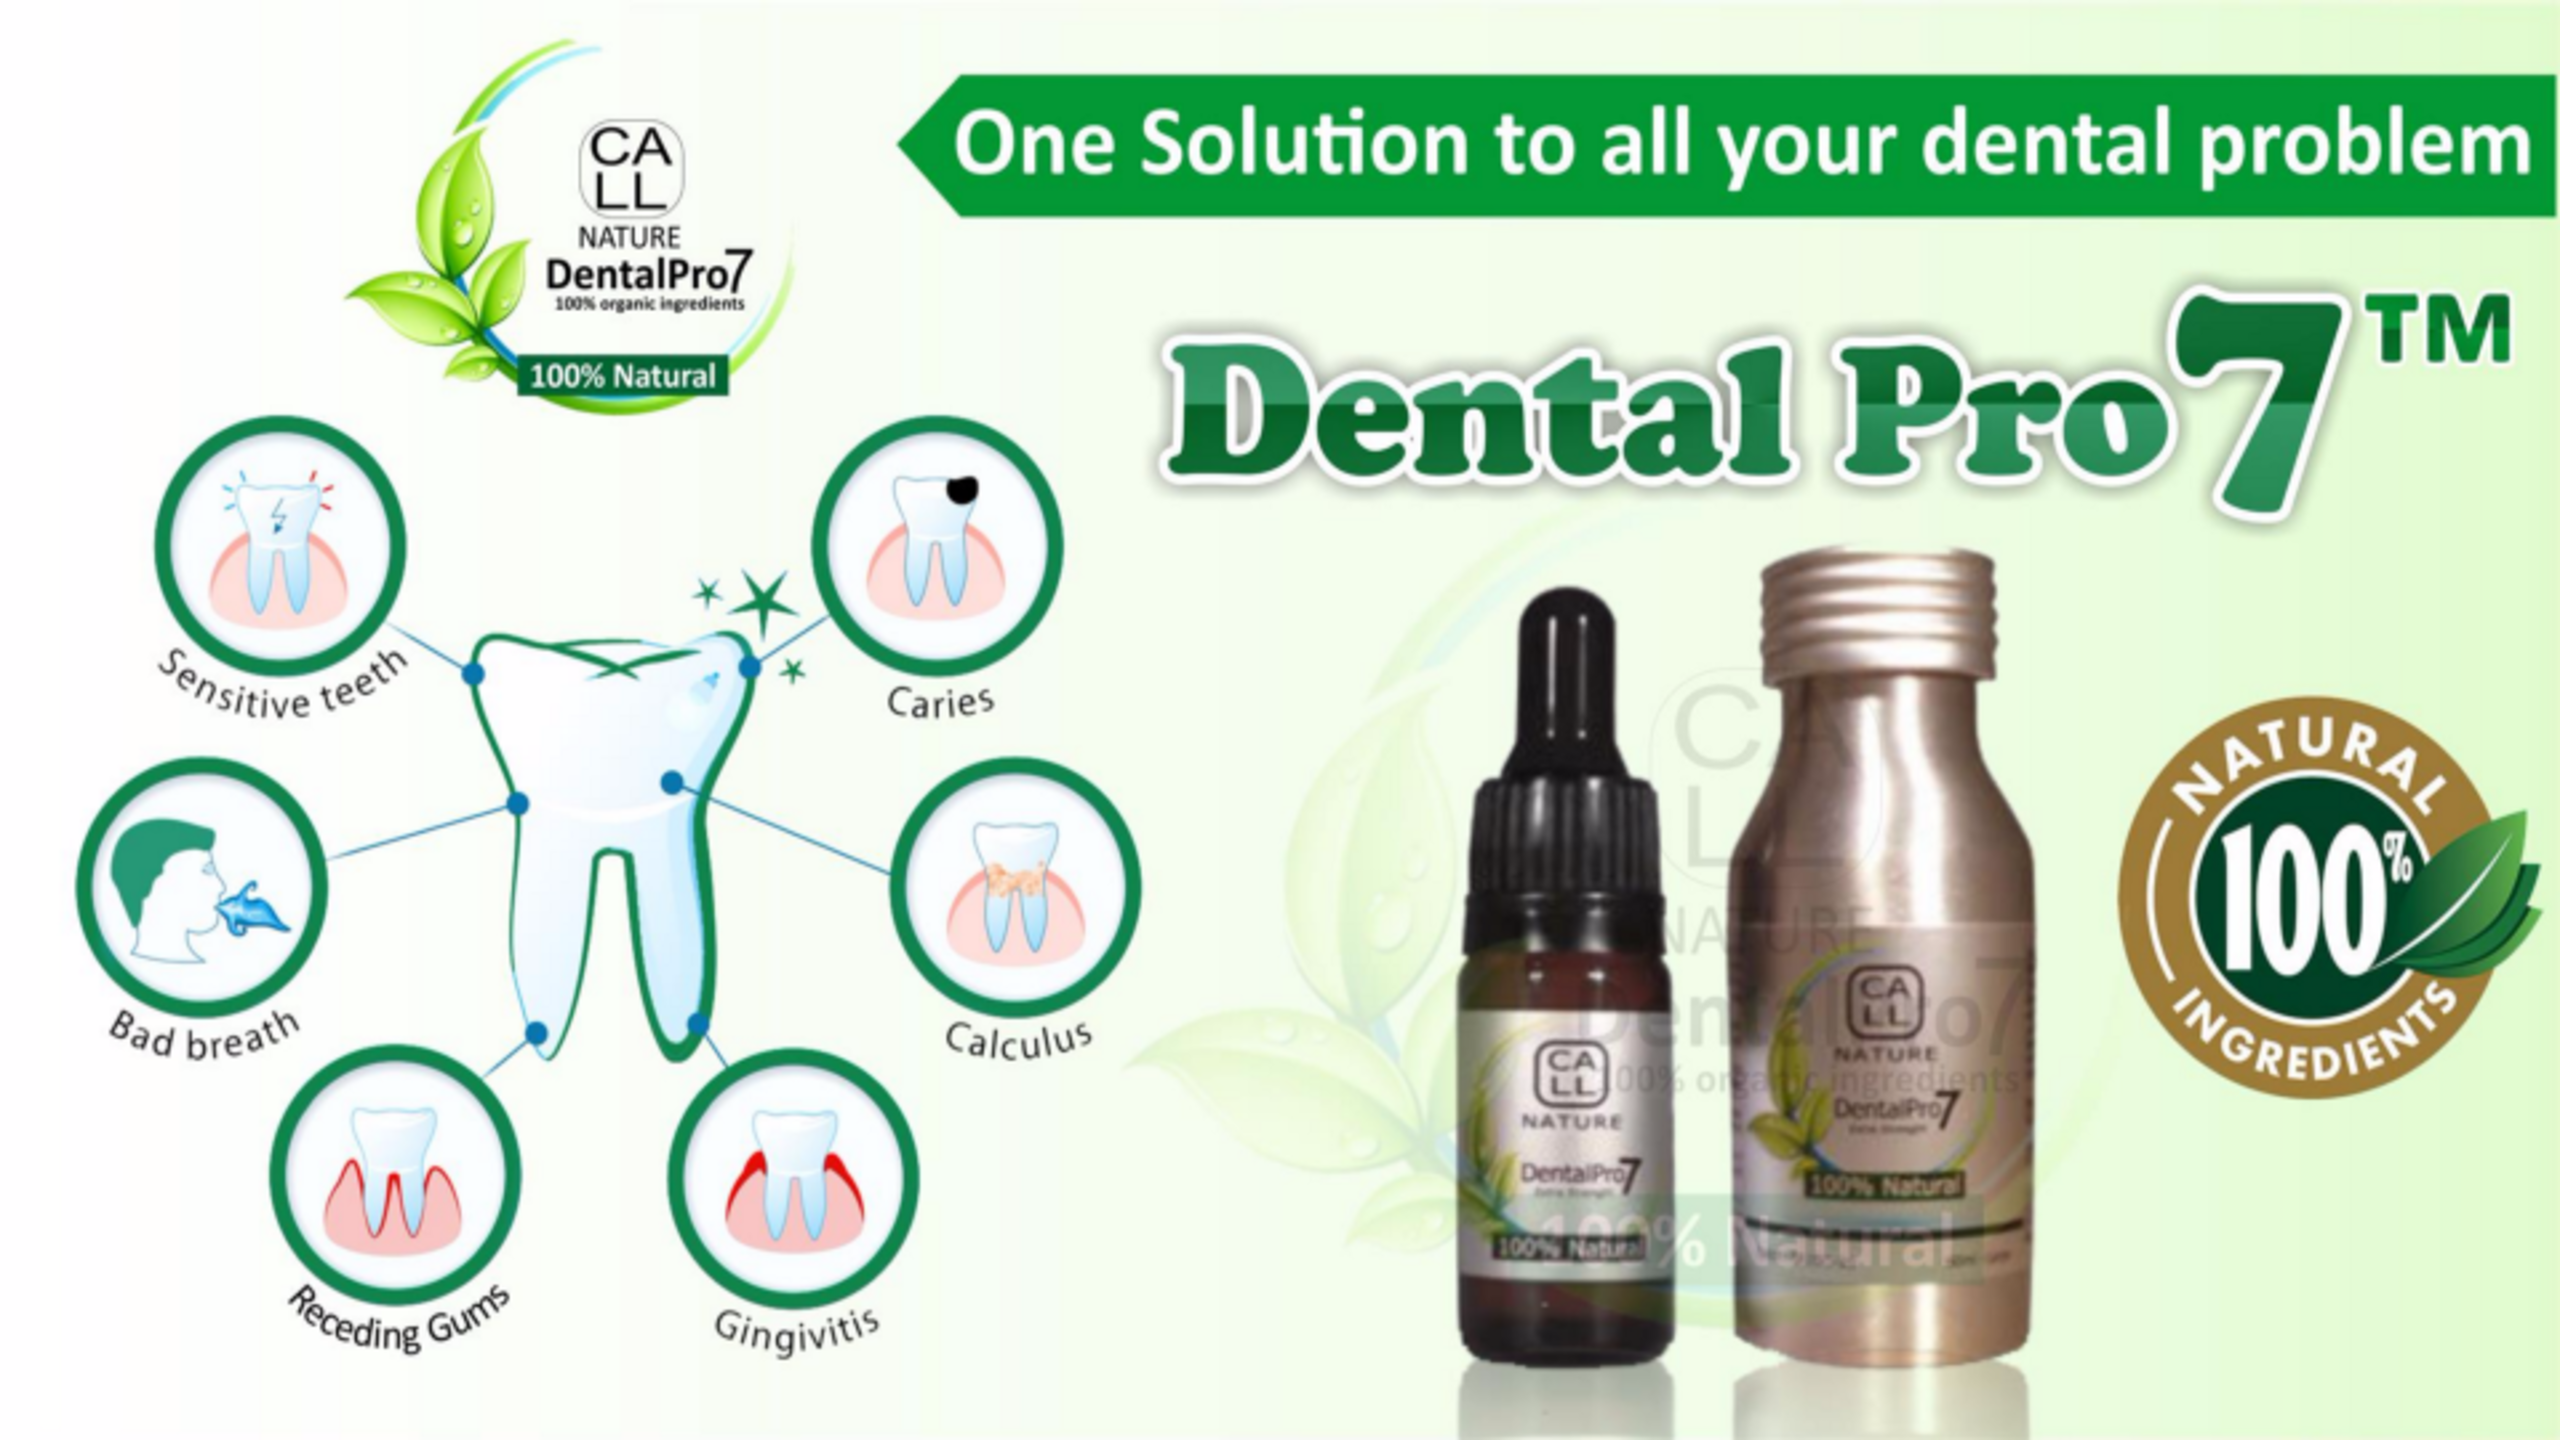 Dental Pro 7 Review What Makes Dental Pro 7 So Unique The